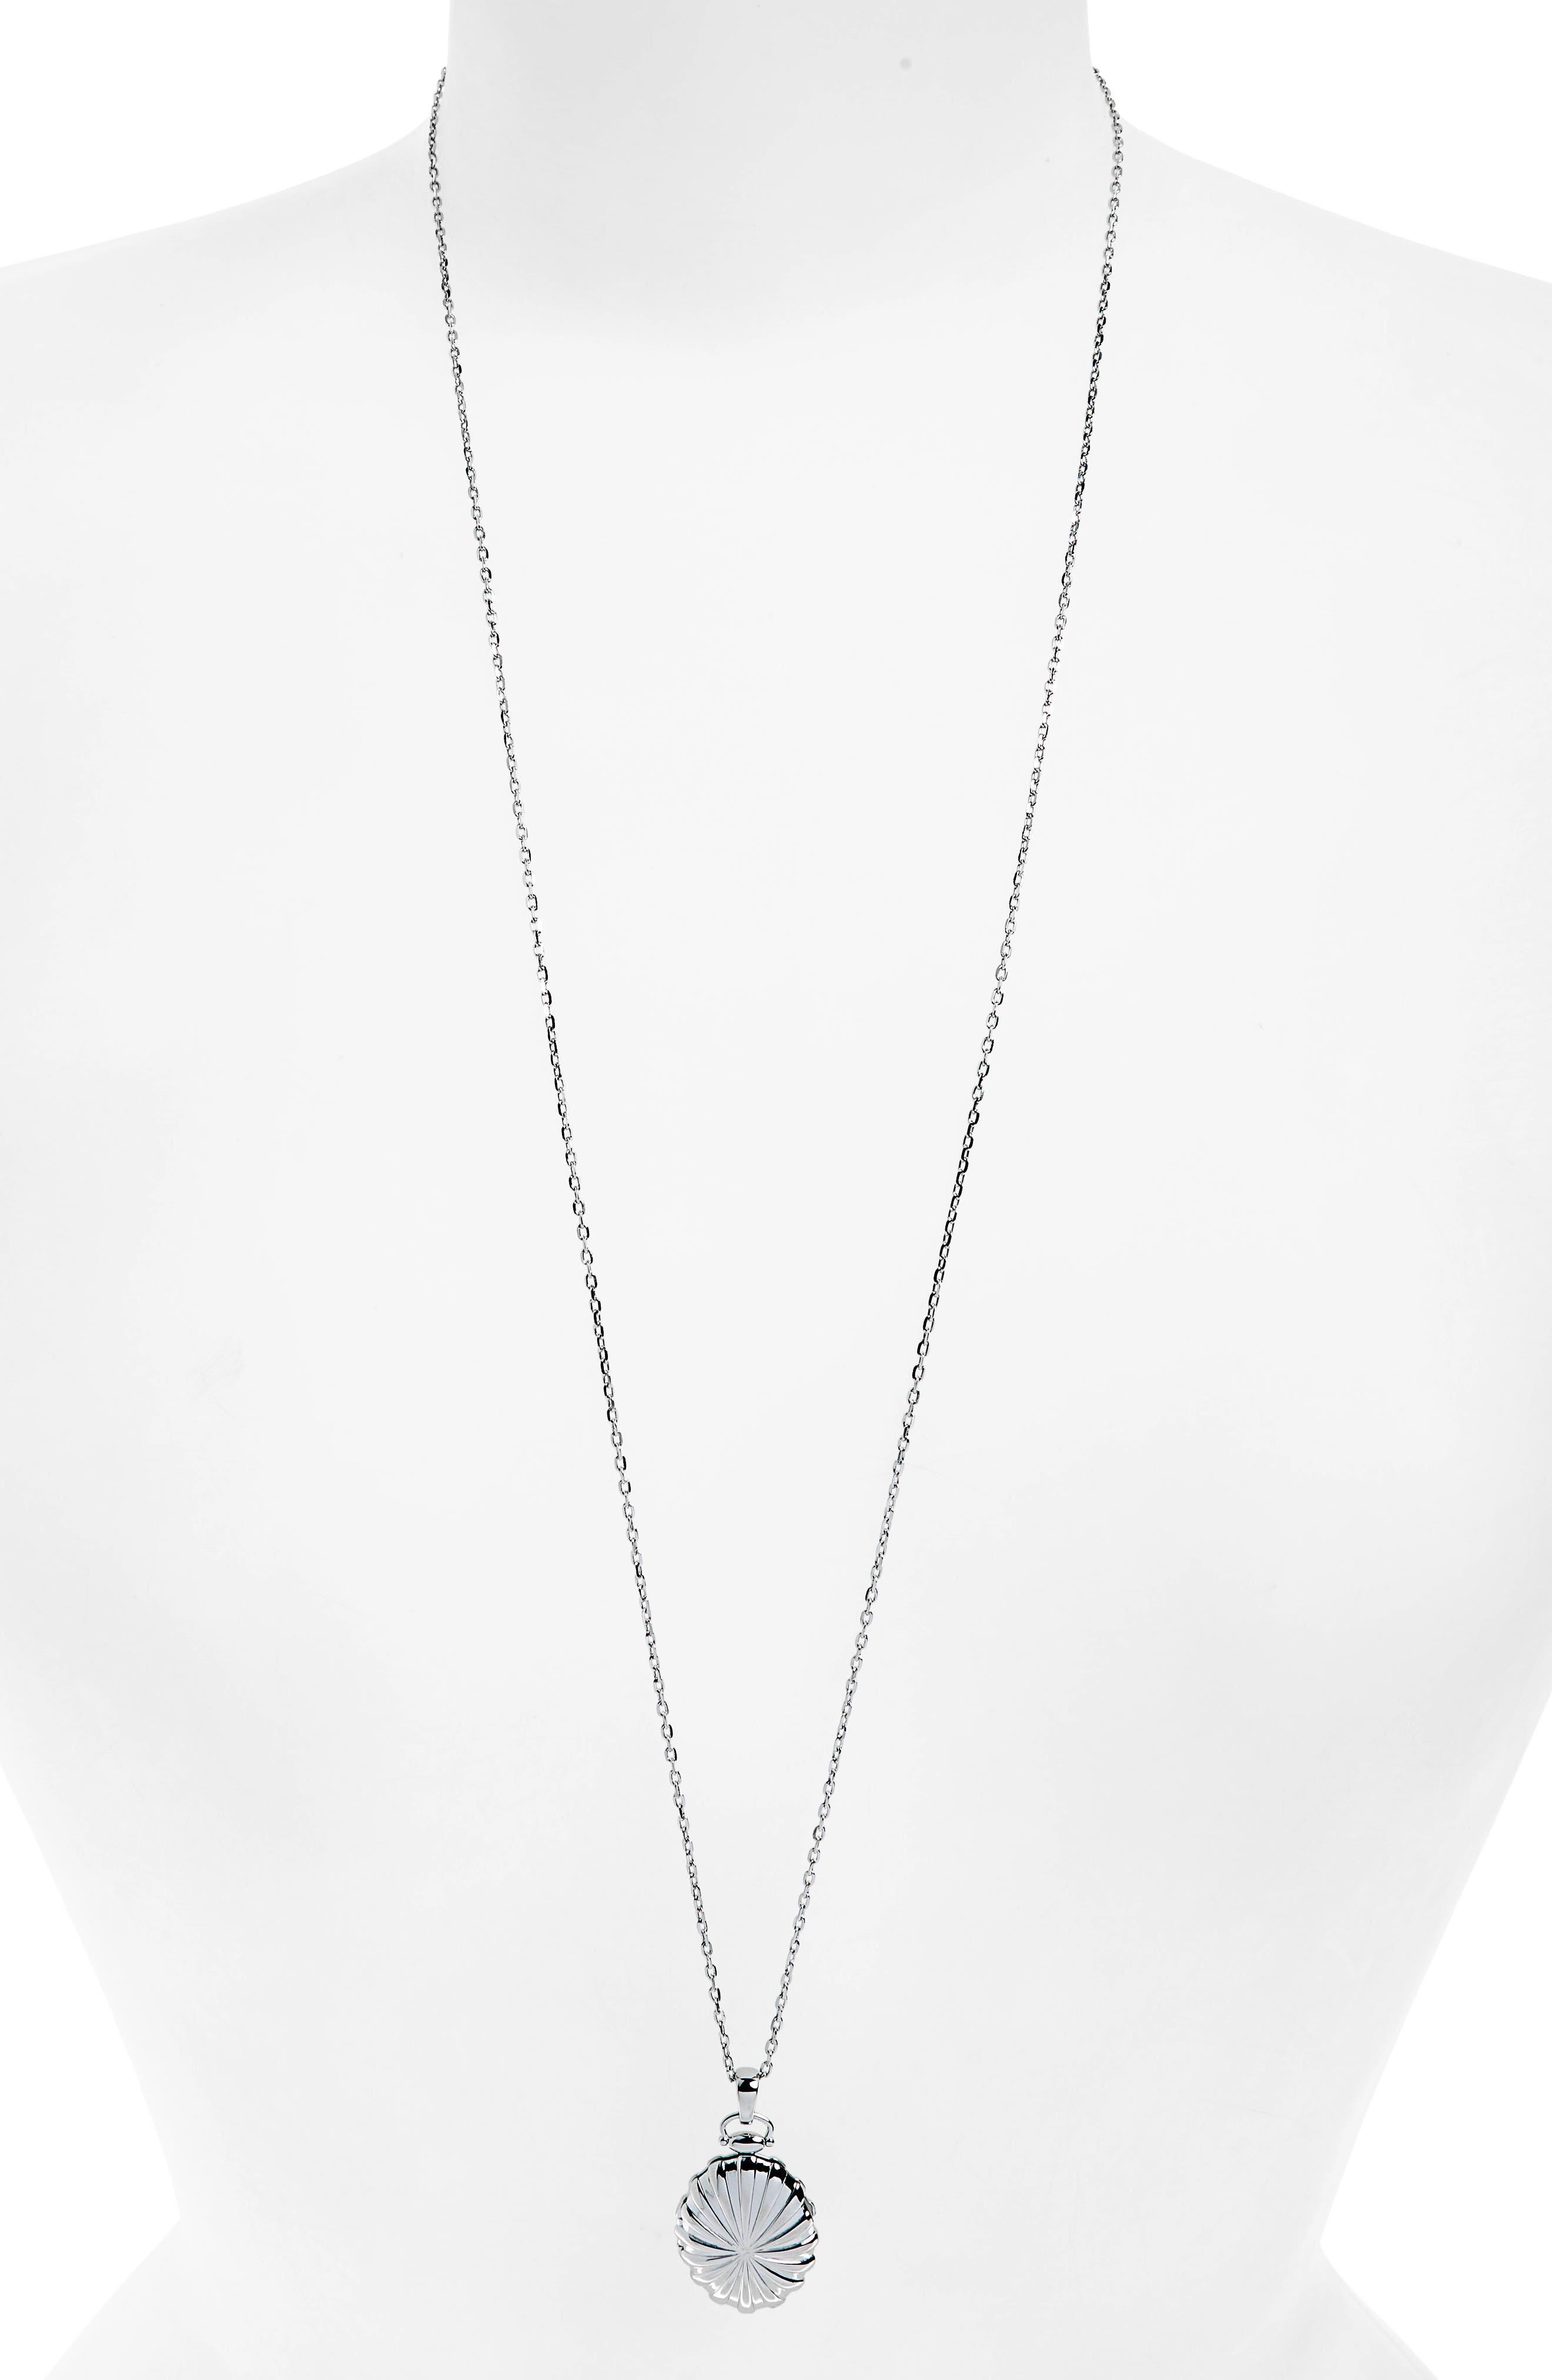 Sunburst Locket Necklace,                             Main thumbnail 1, color,                             STERLING SILVER